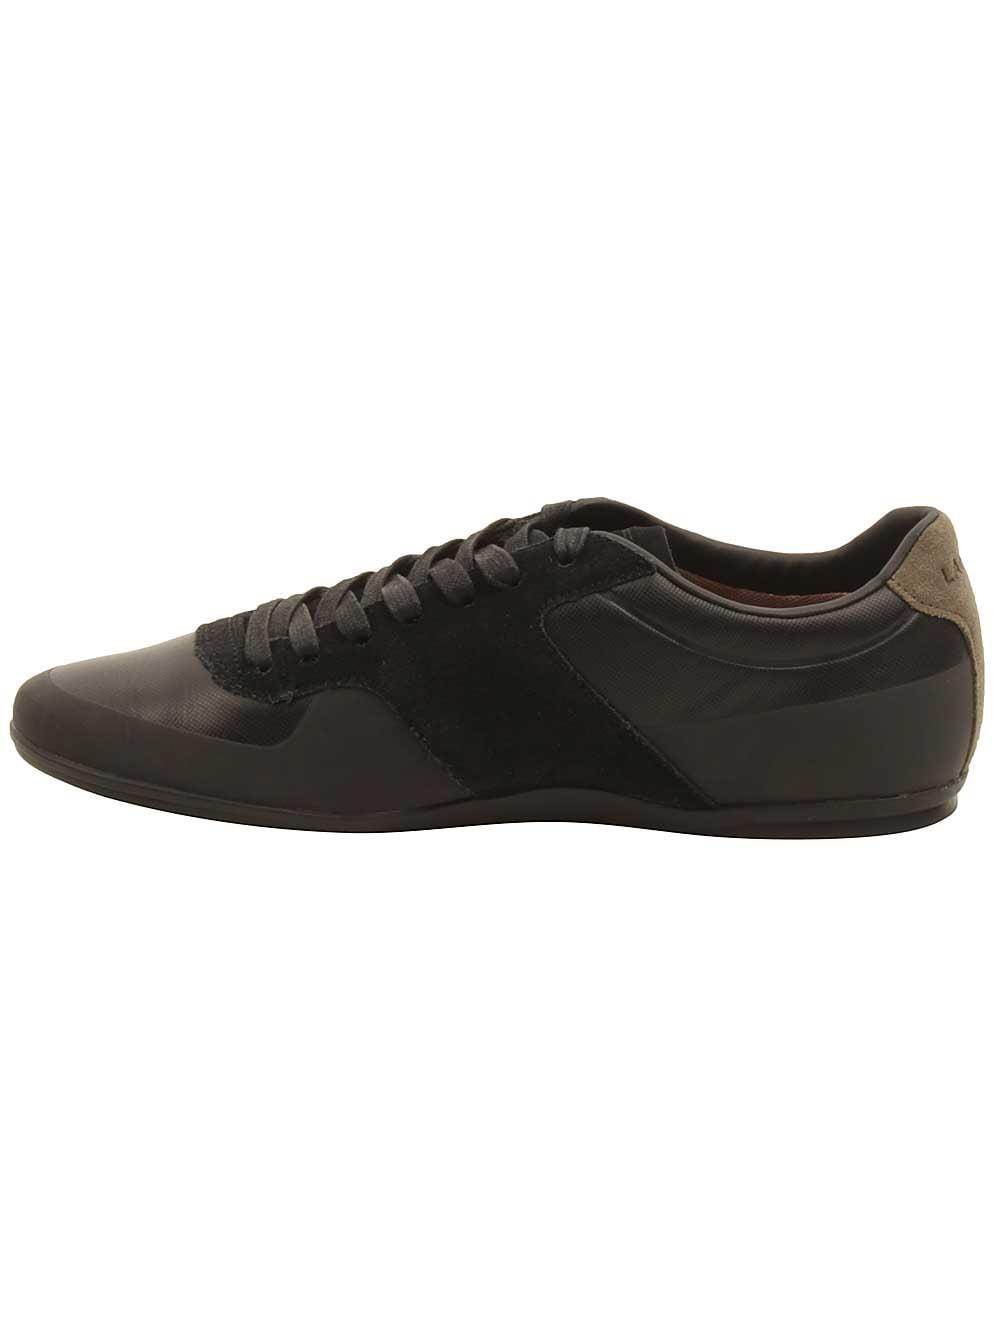 Lacoste Mens Turnier 117 Sneakers in Black